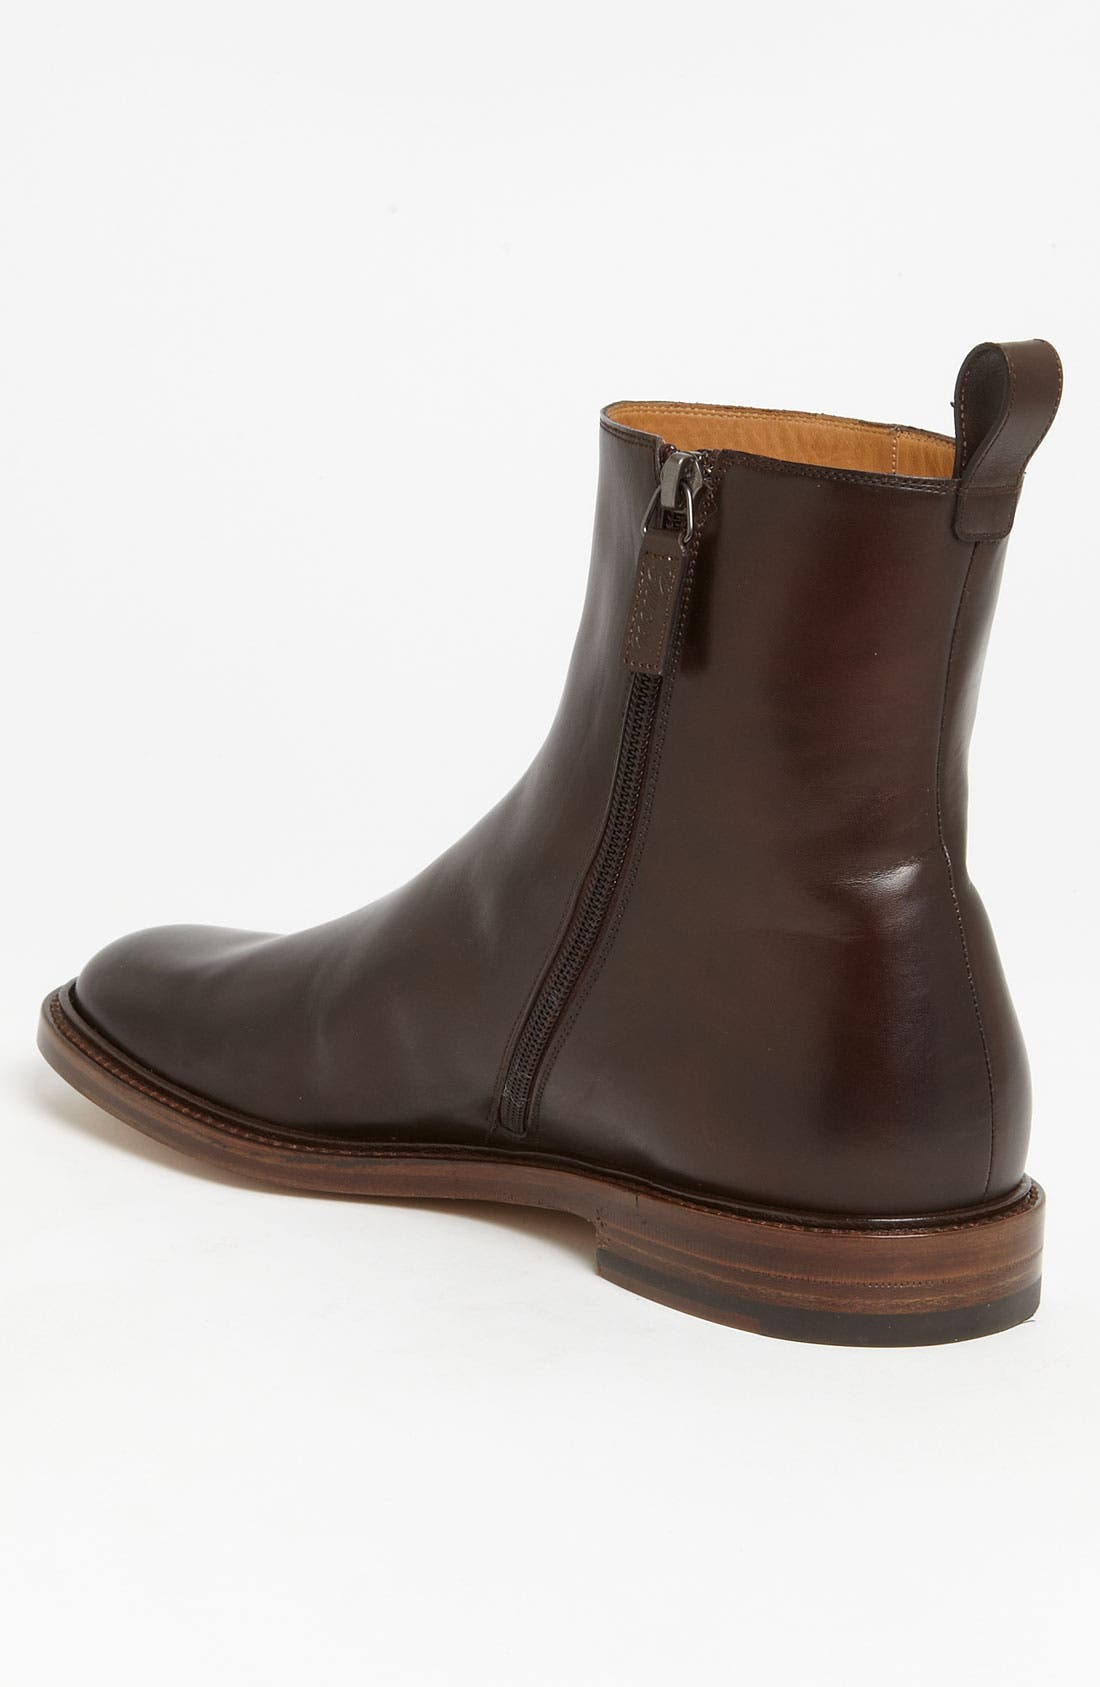 Alternate Image 2  - Gucci 'Cezanne' Plain Toe Boot